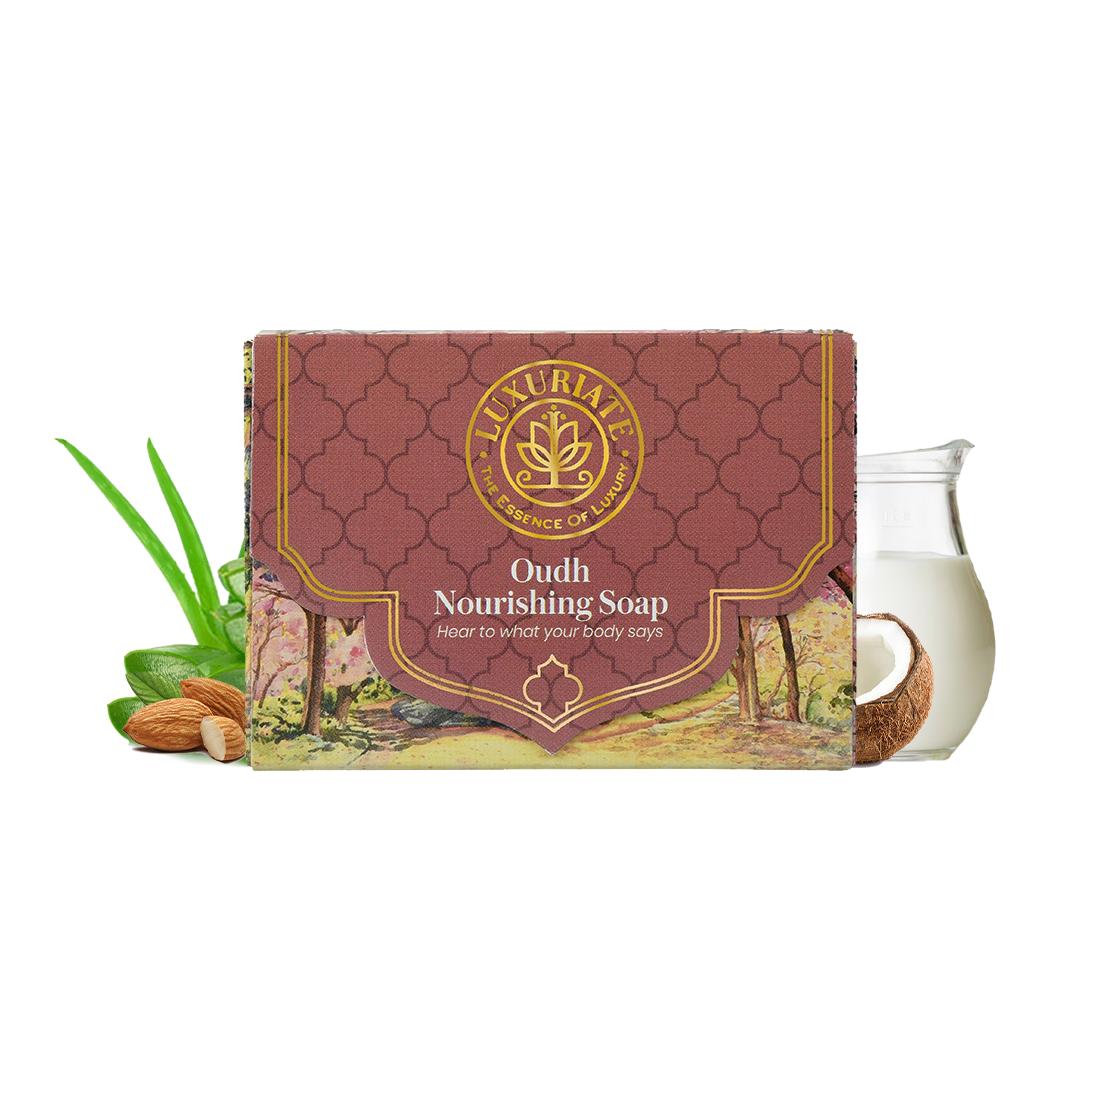 LUXURIATE | LUXURIATE Naturally Oudh Nourashing Winter Soap for Men and Women,125 Gm